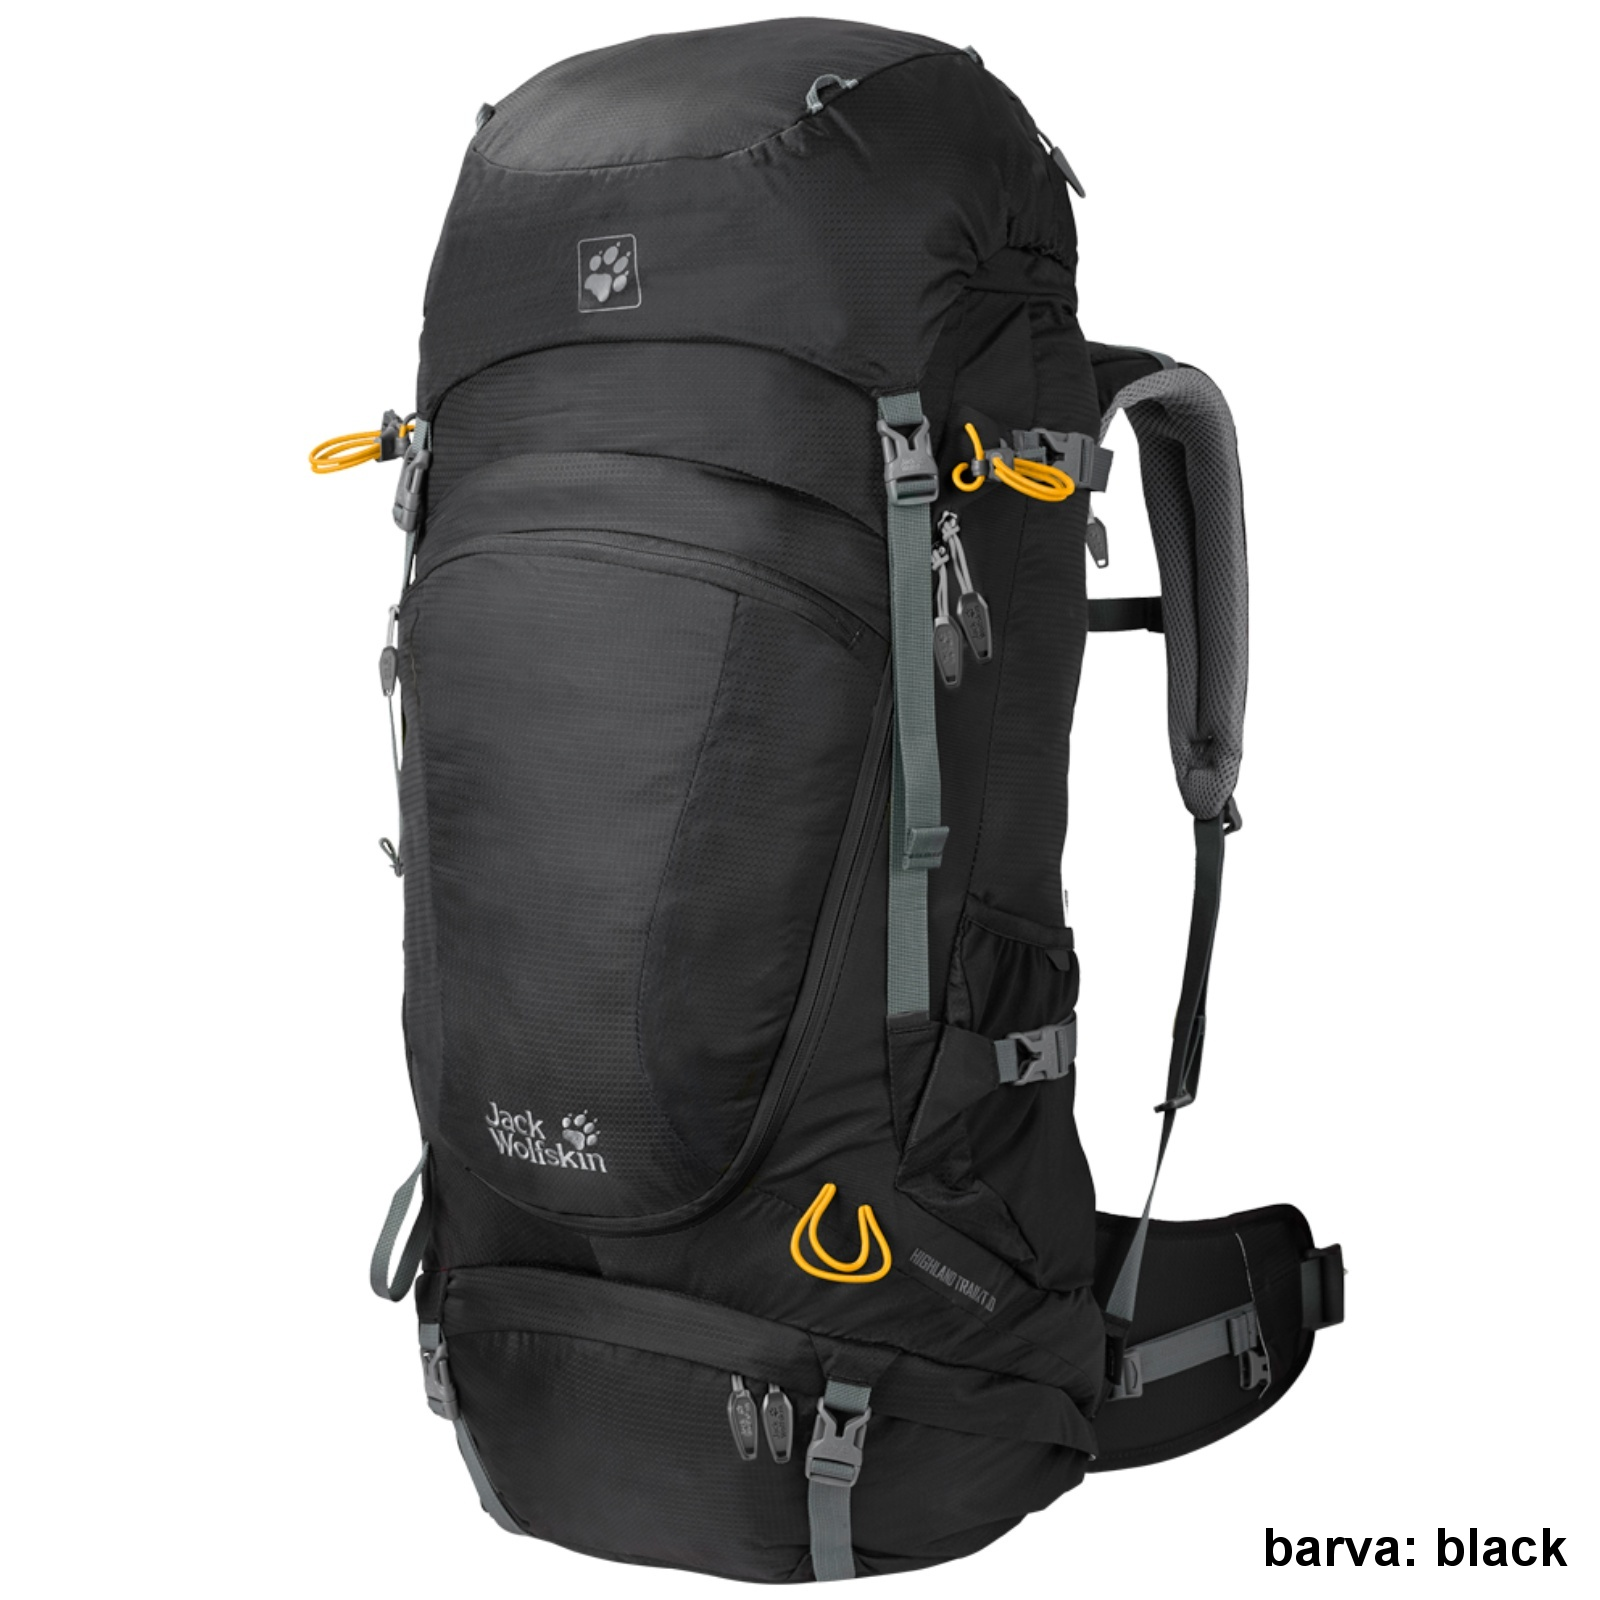 Batoh JACK WOLFSKIN Highland Trail XT 50 - black